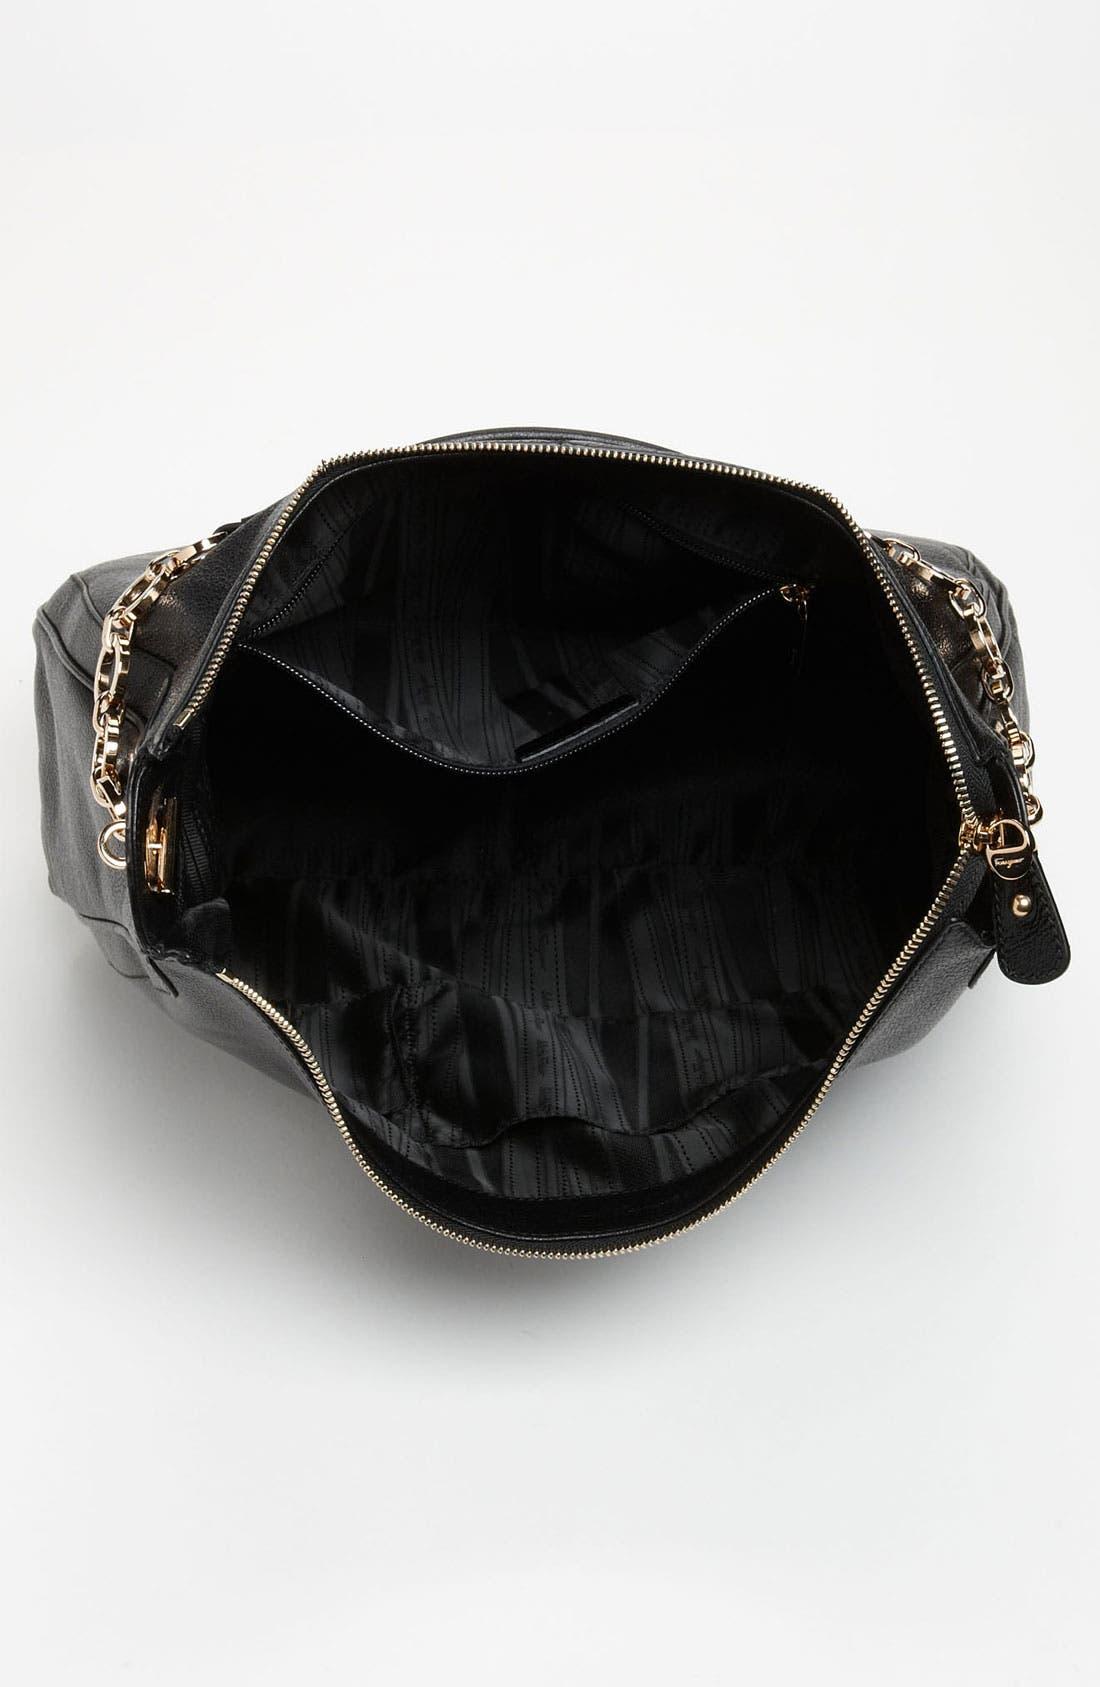 Alternate Image 3  - Salvatore Ferragamo 'Conny' Leather Hobo